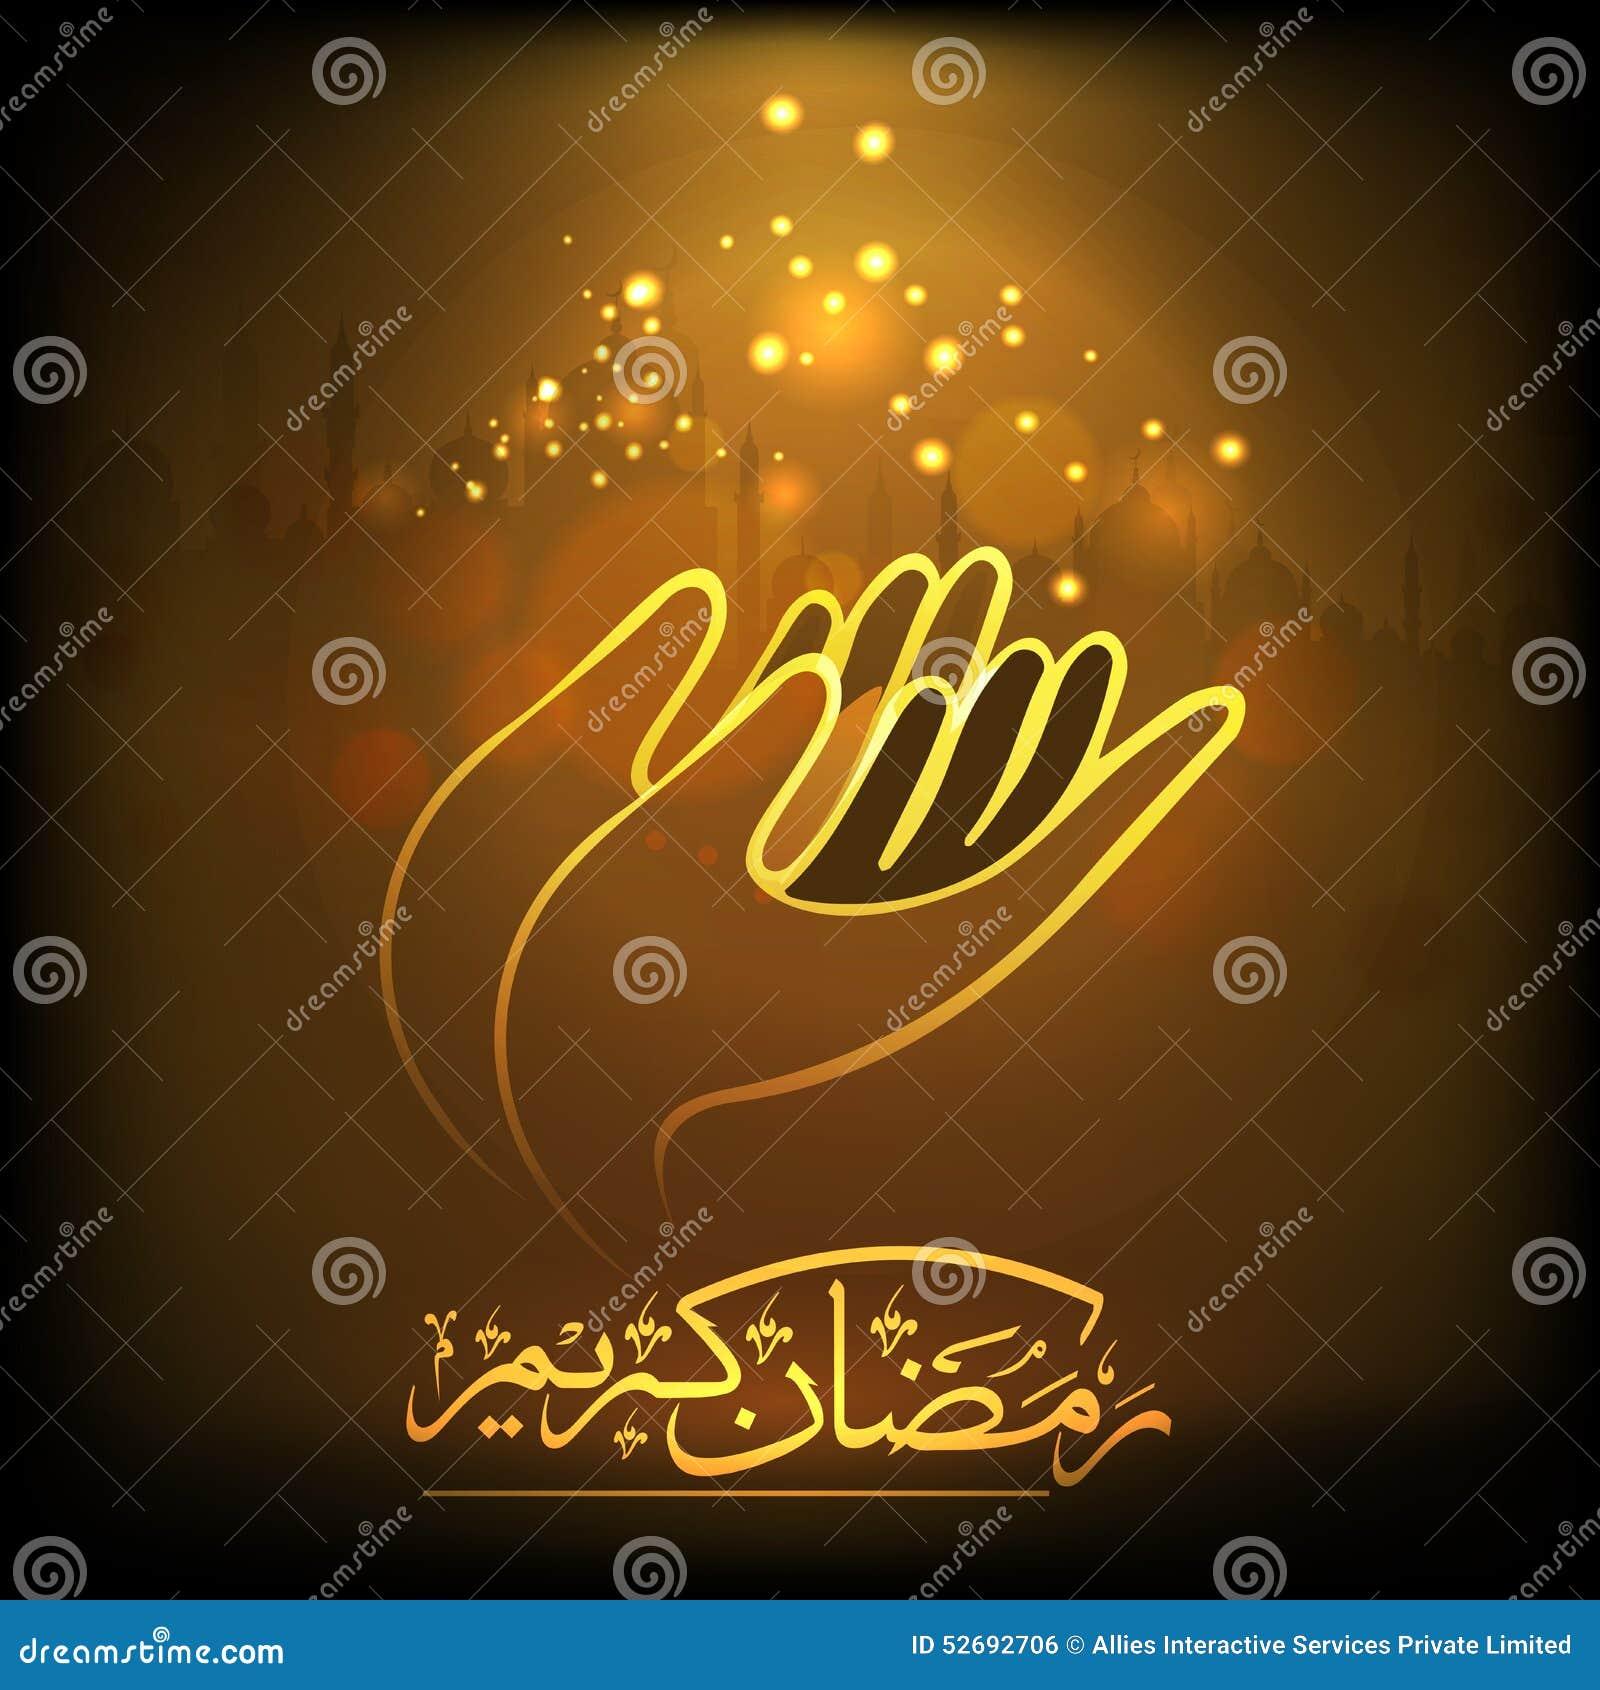 Praying human hands with arabic calligraphy for ramadan